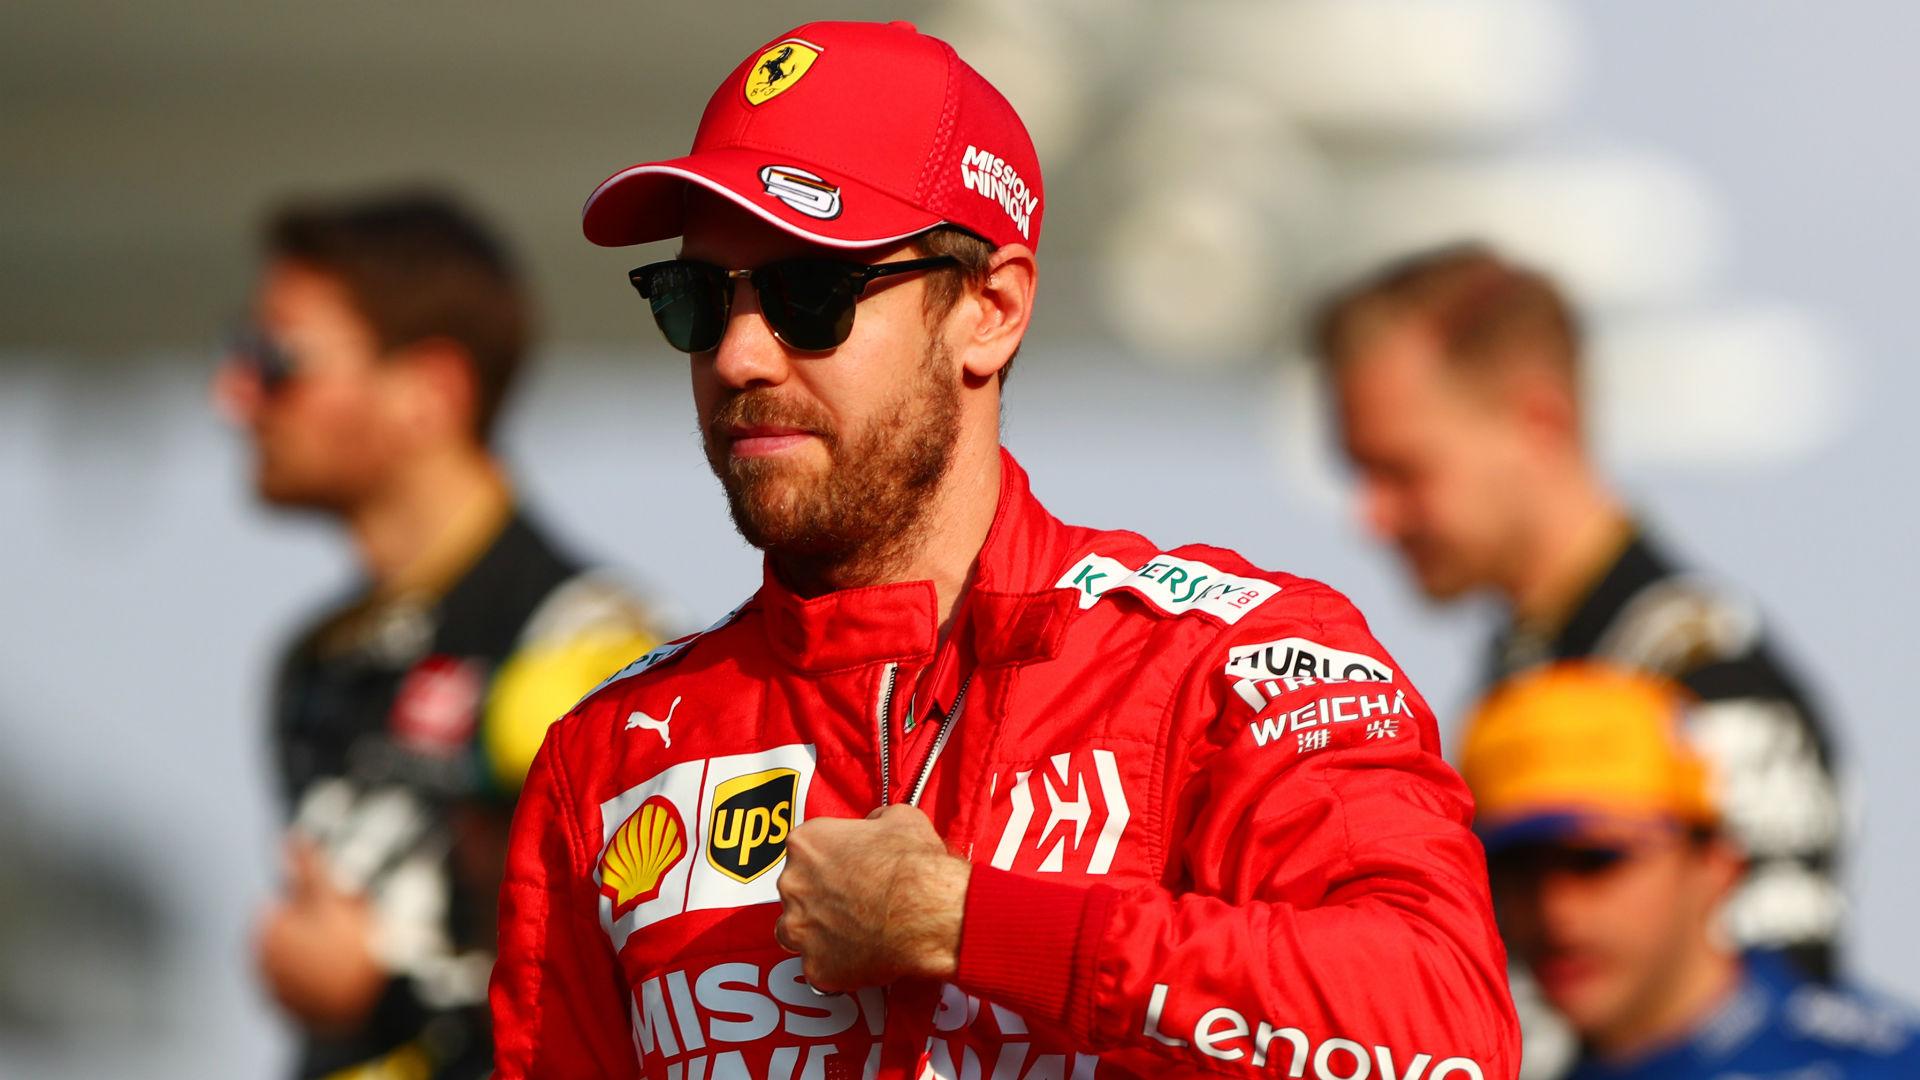 Vettel: Ferrari's 2019 season not as bad as it looks